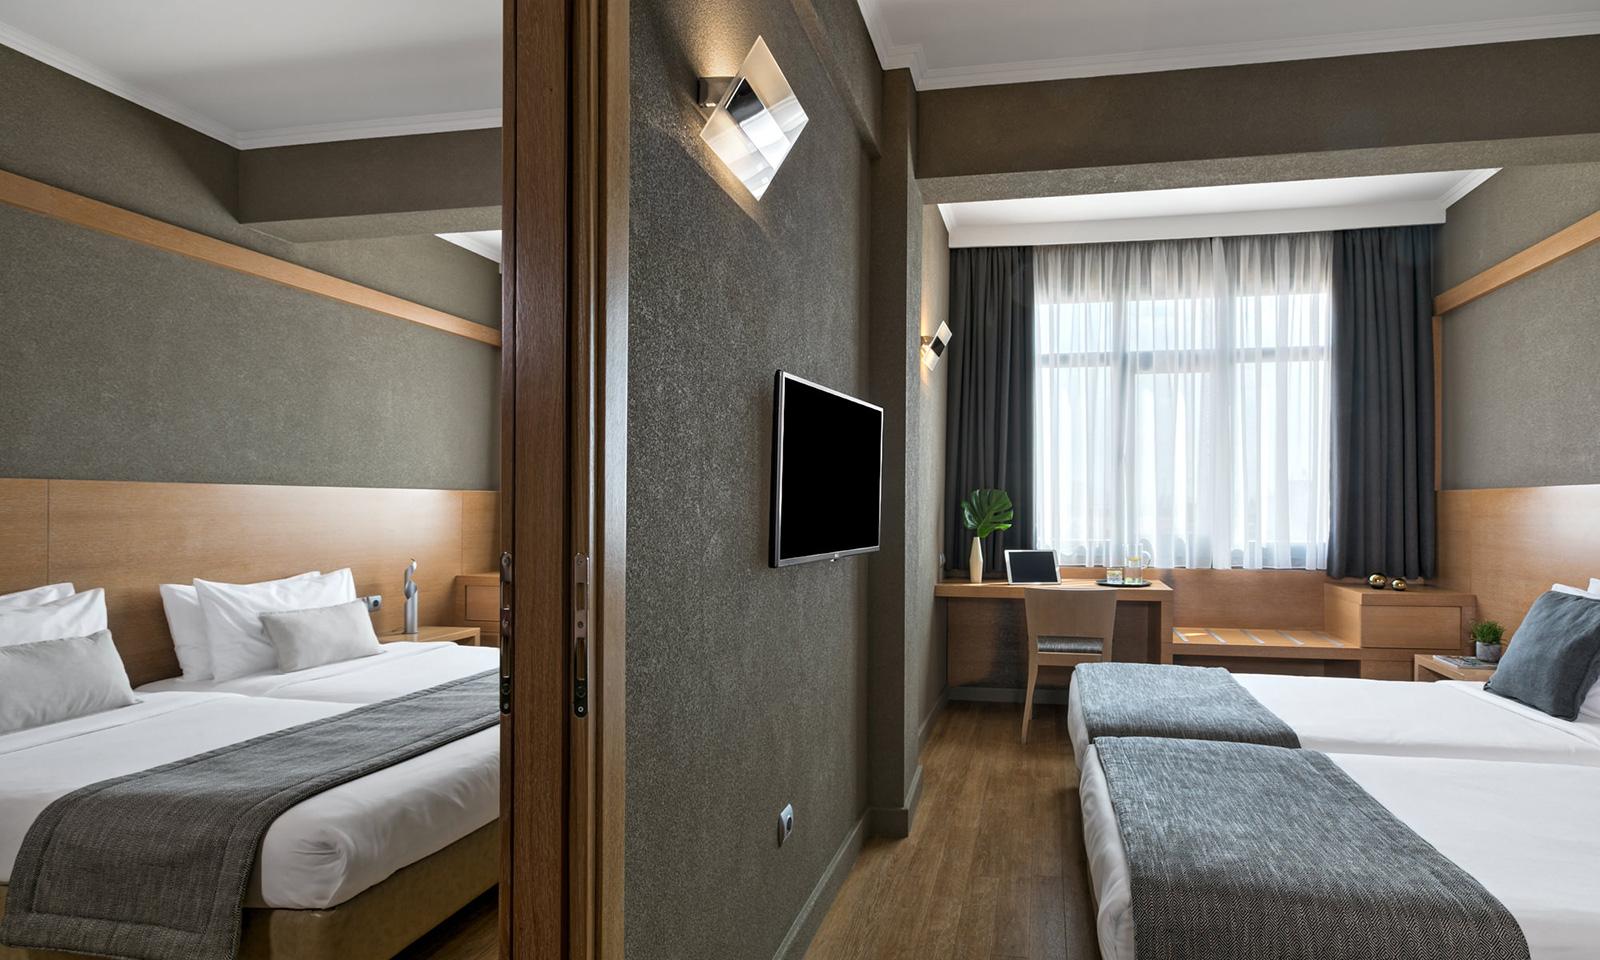 7b0de418ee68 Ξενοδοχείο Porto Palace Hotel Θεσσαλονίκη